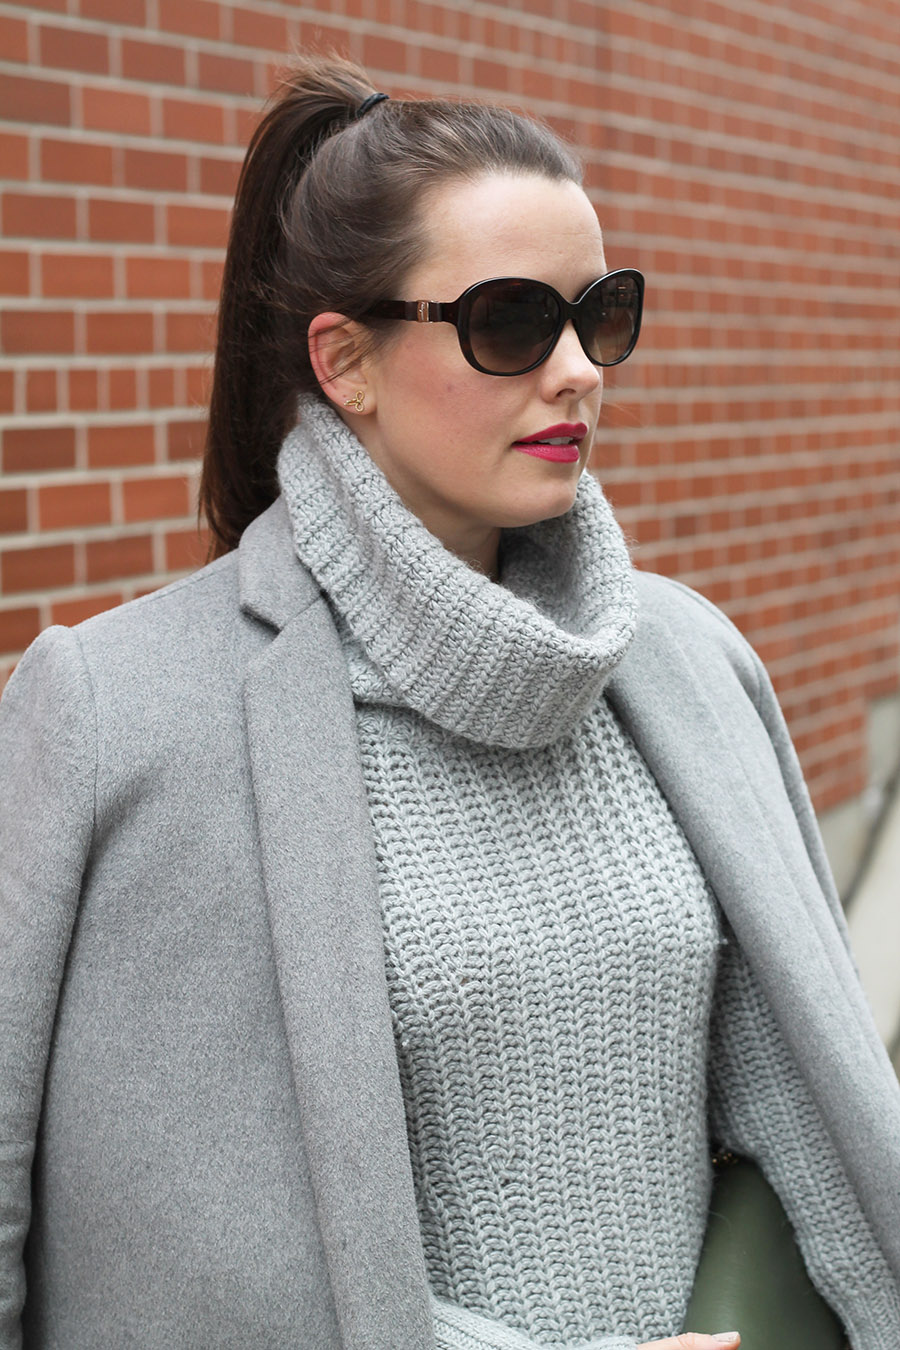 Grey Turtle Neck Sweater, Salvatore Ferragamo Sunglasses, Grey Wool Coat